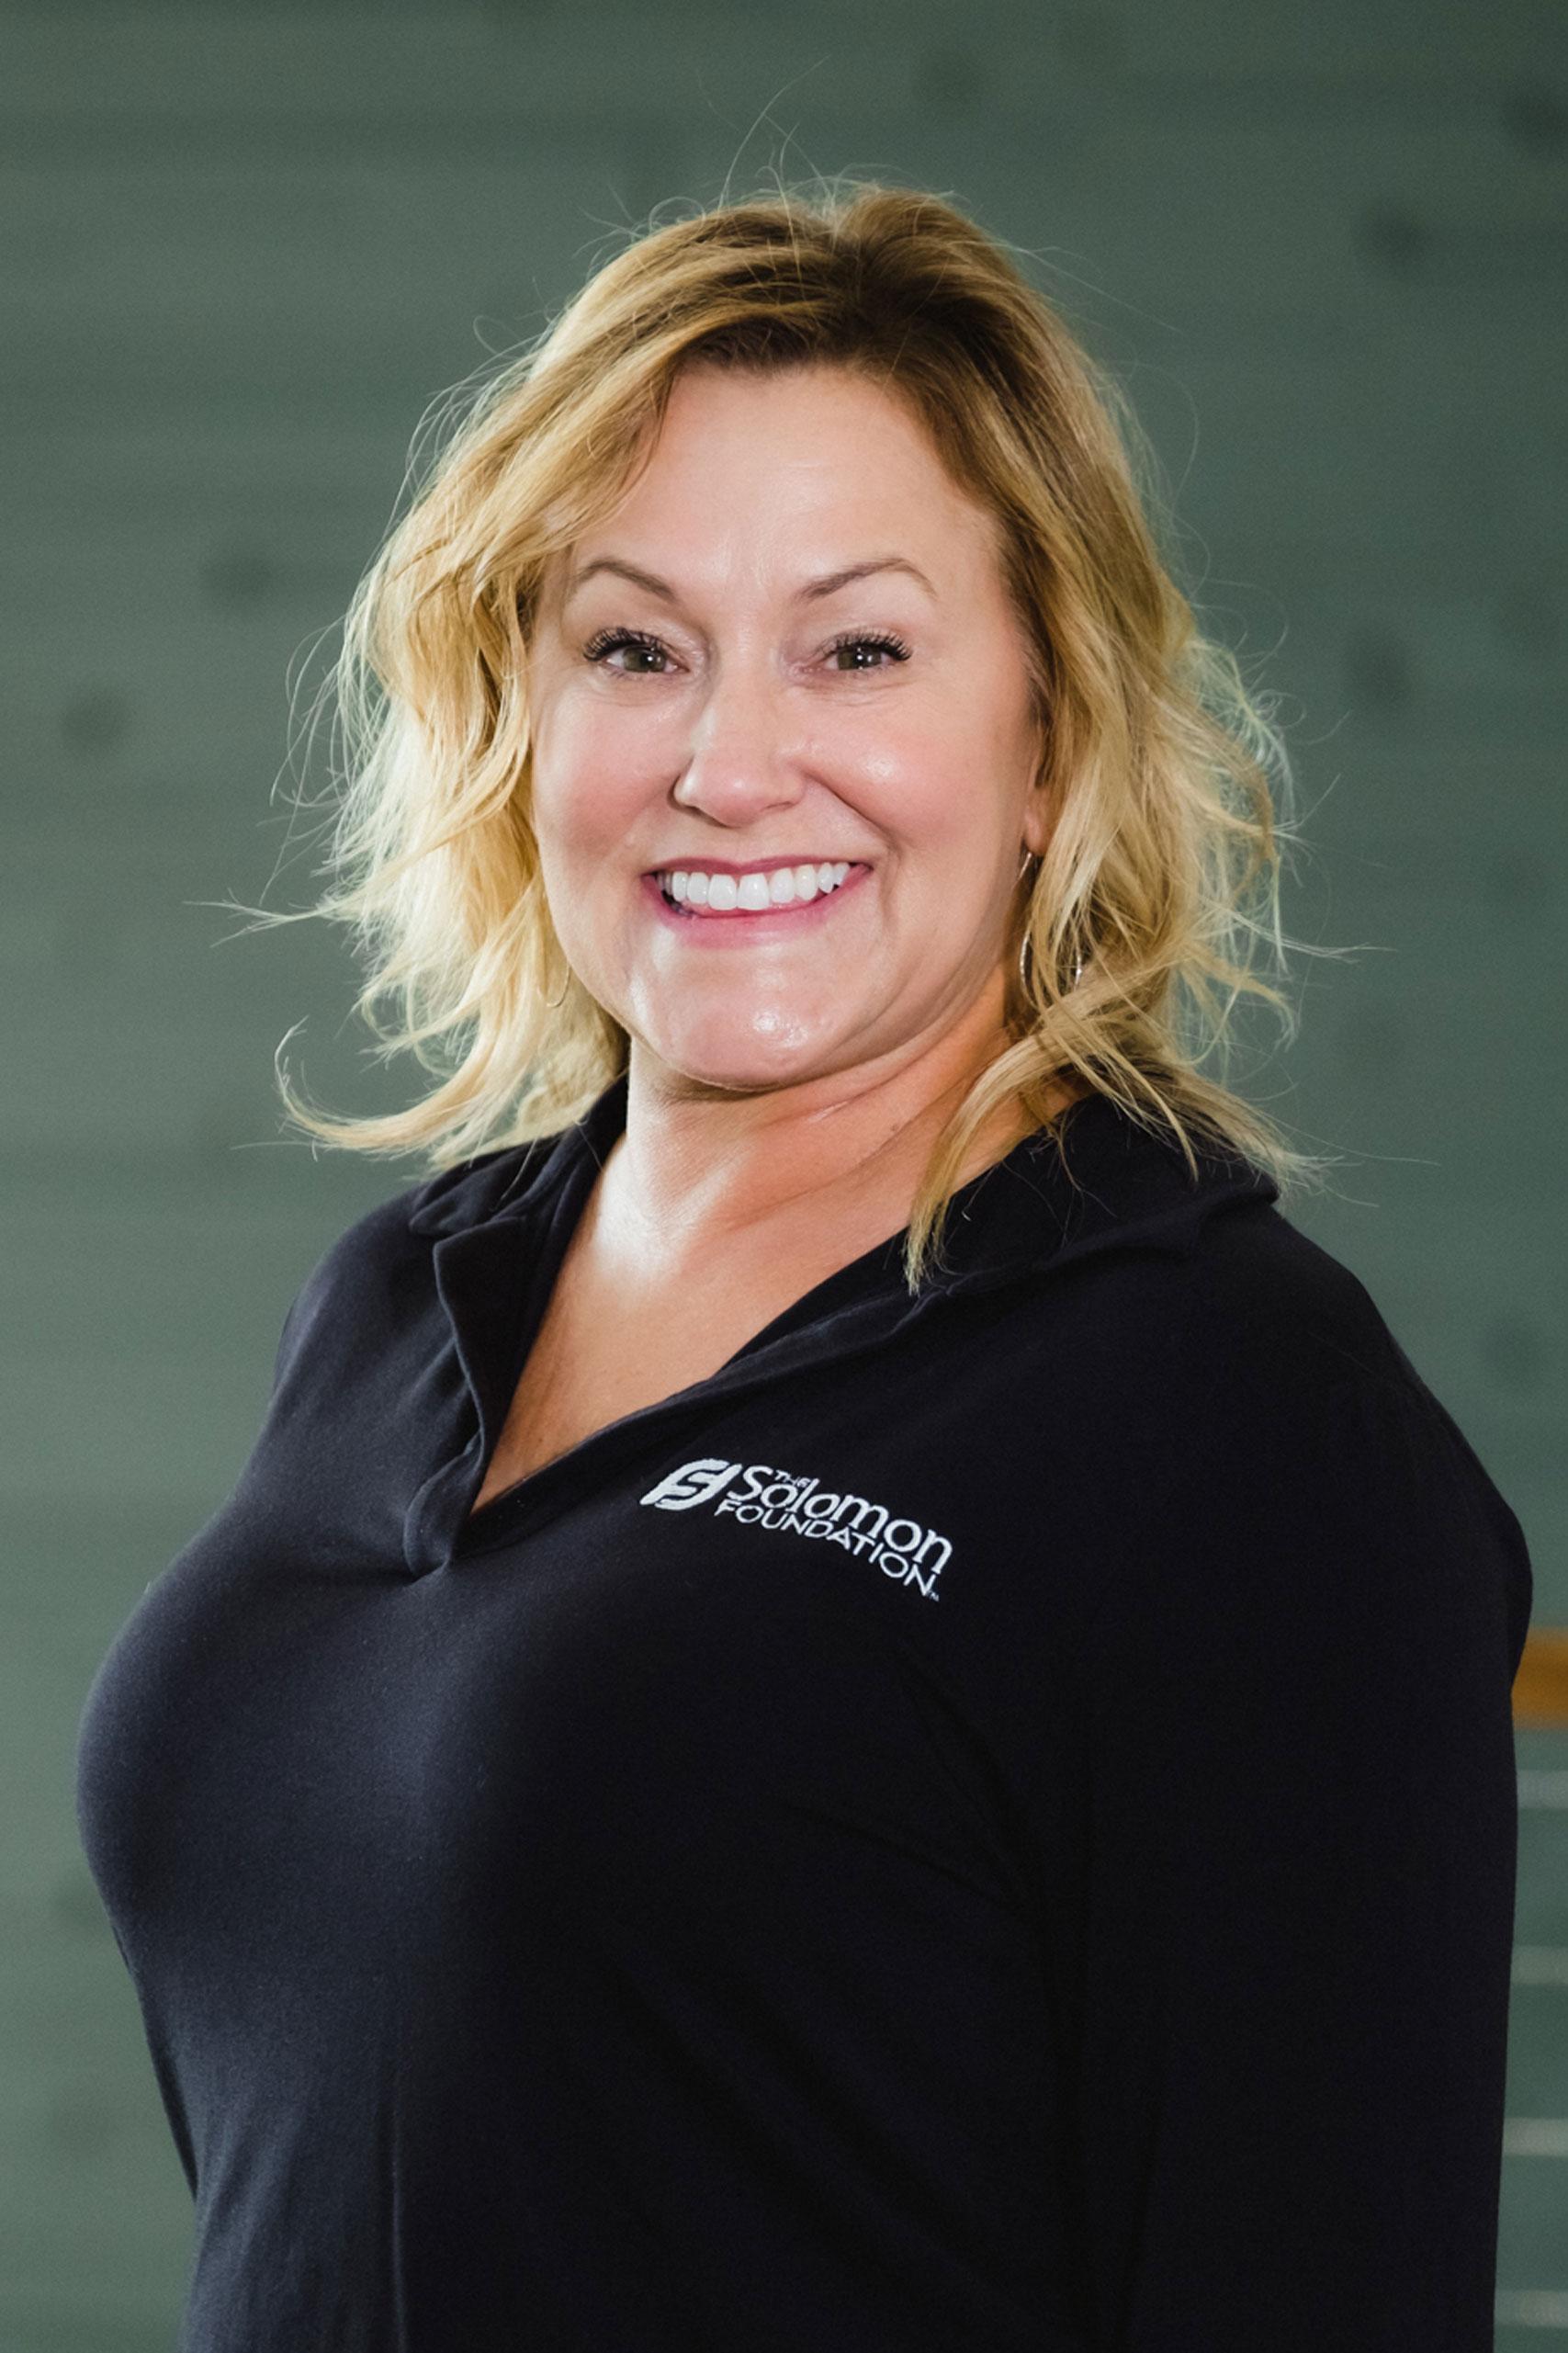 Susan Donahue